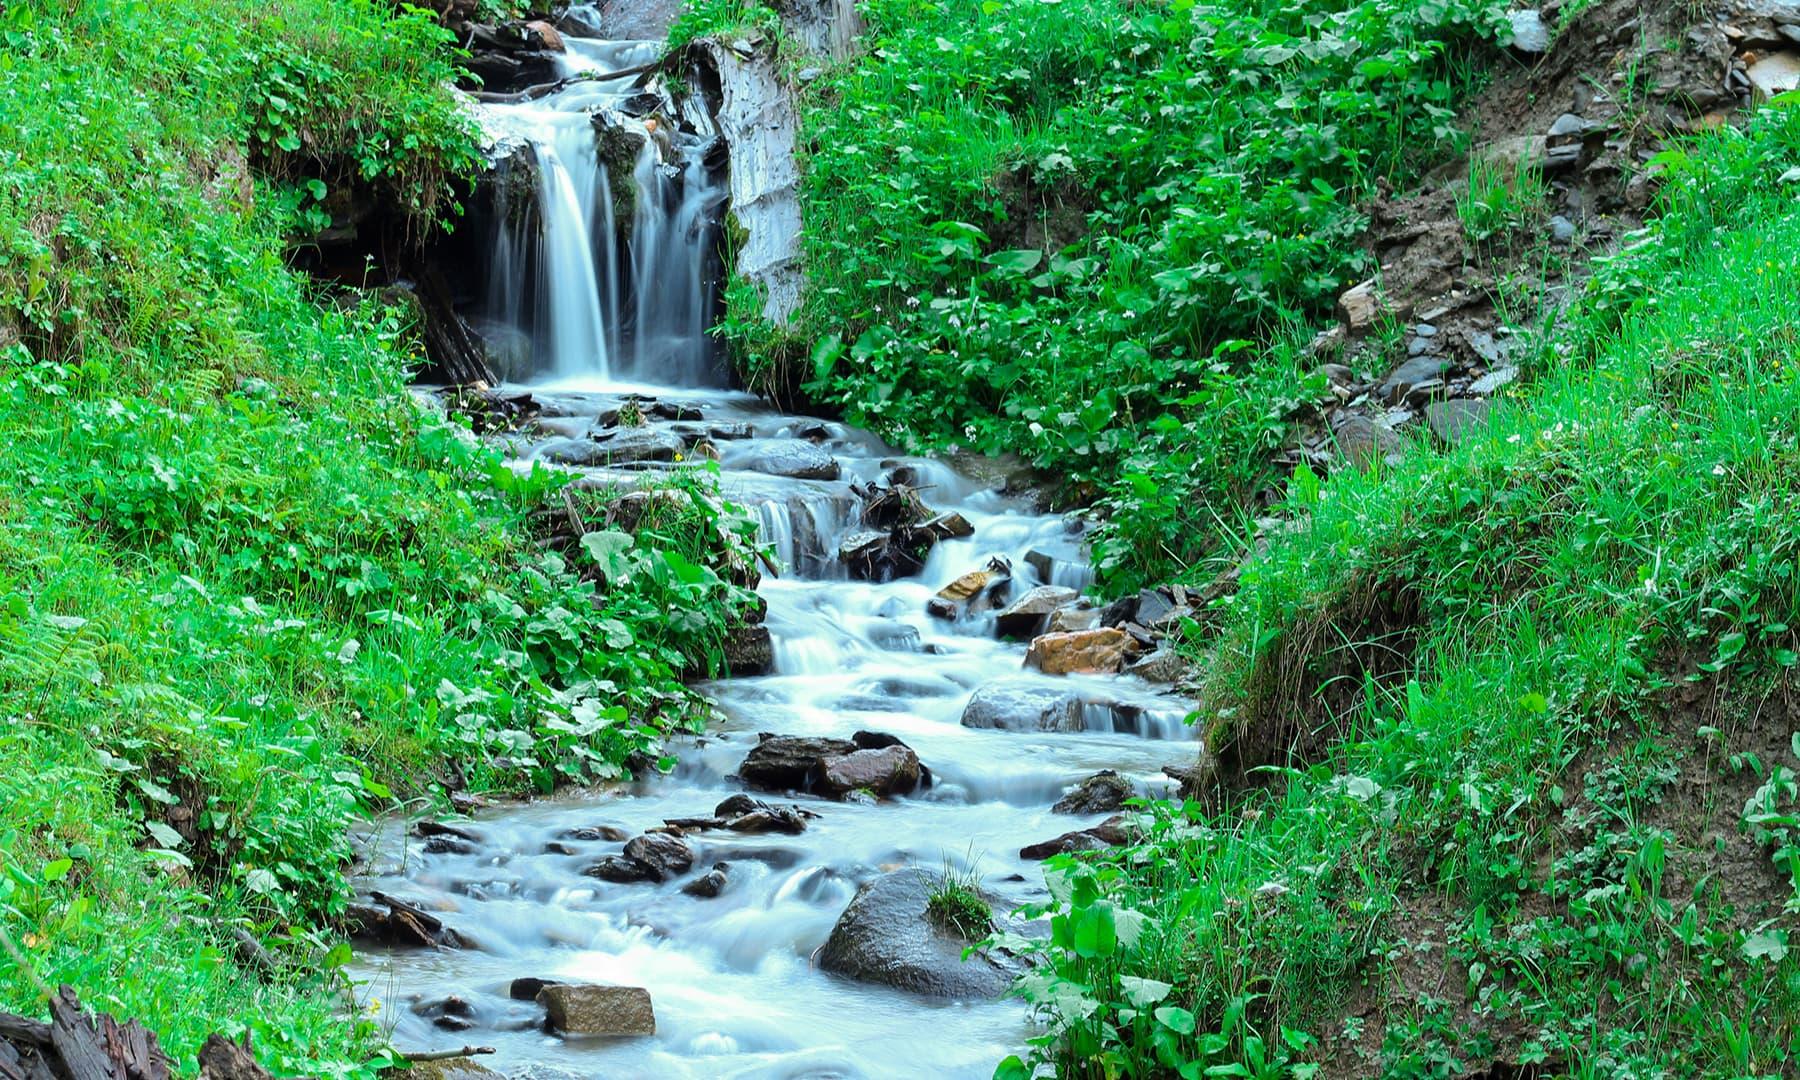 Waterfalls in Arang Kel. —Asif Mahmood